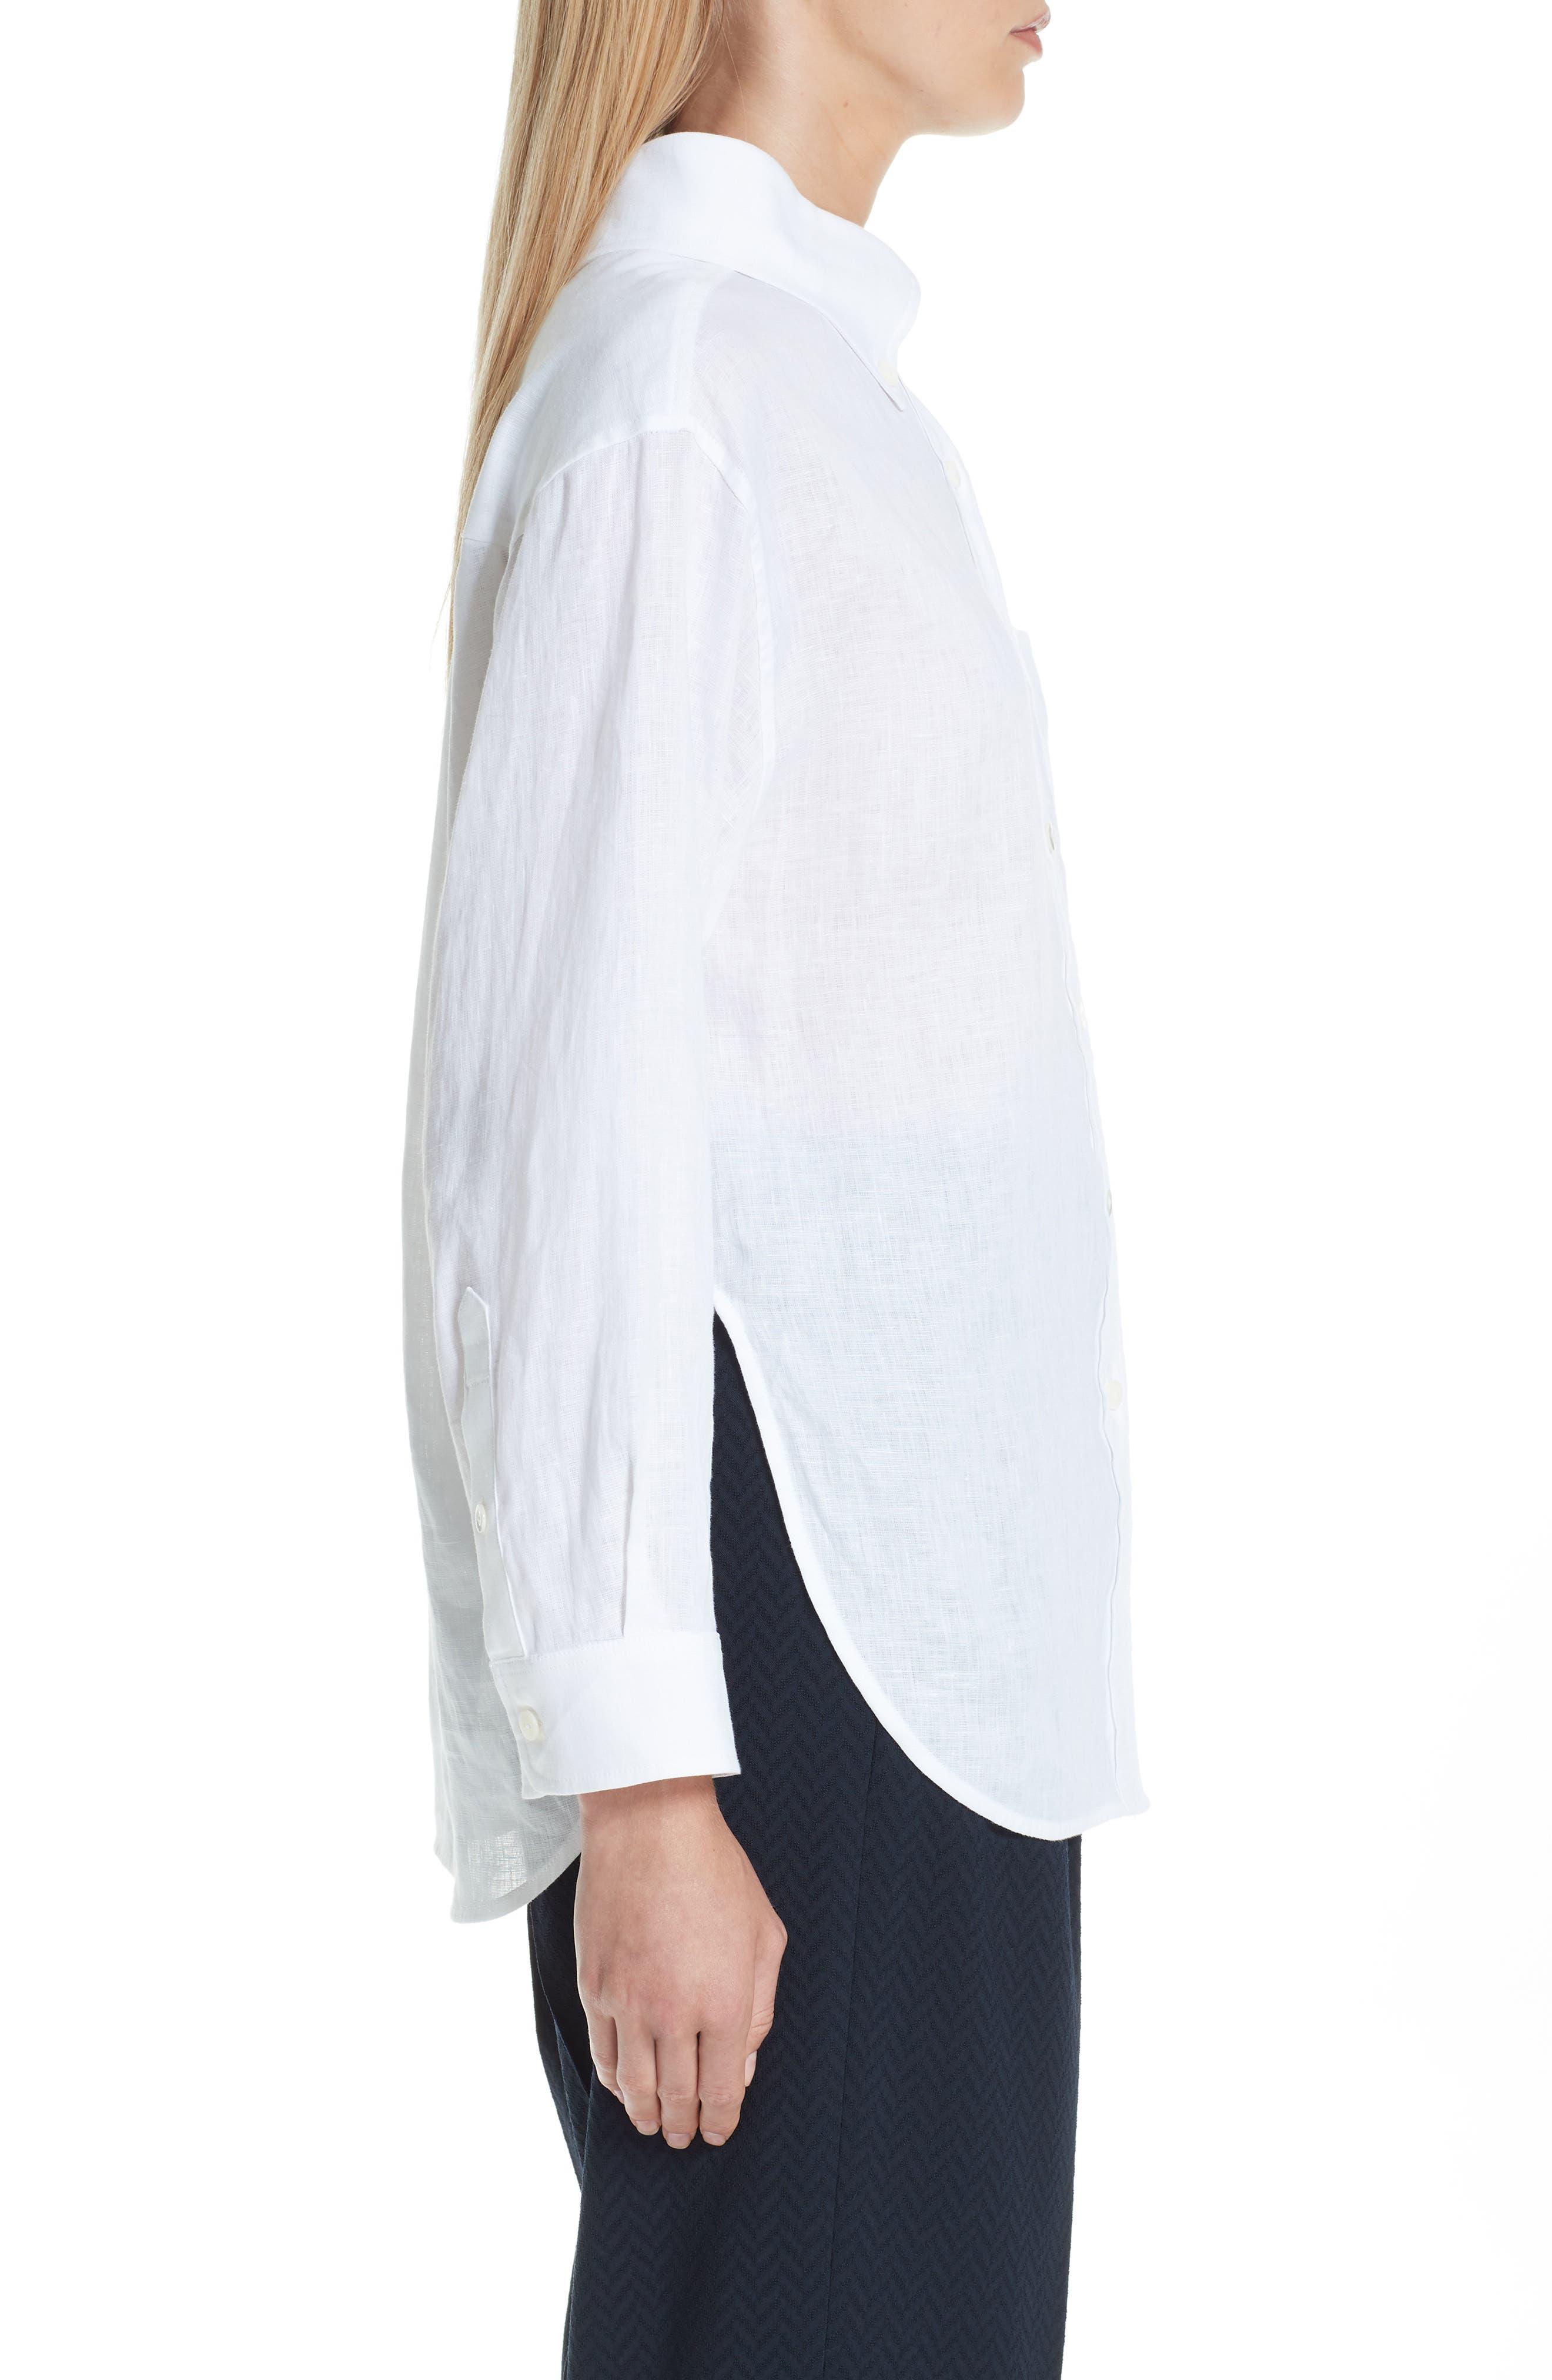 EMPORIO ARMANI,                             Long Sleeve Linen Blouse,                             Alternate thumbnail 3, color,                             BIANCO